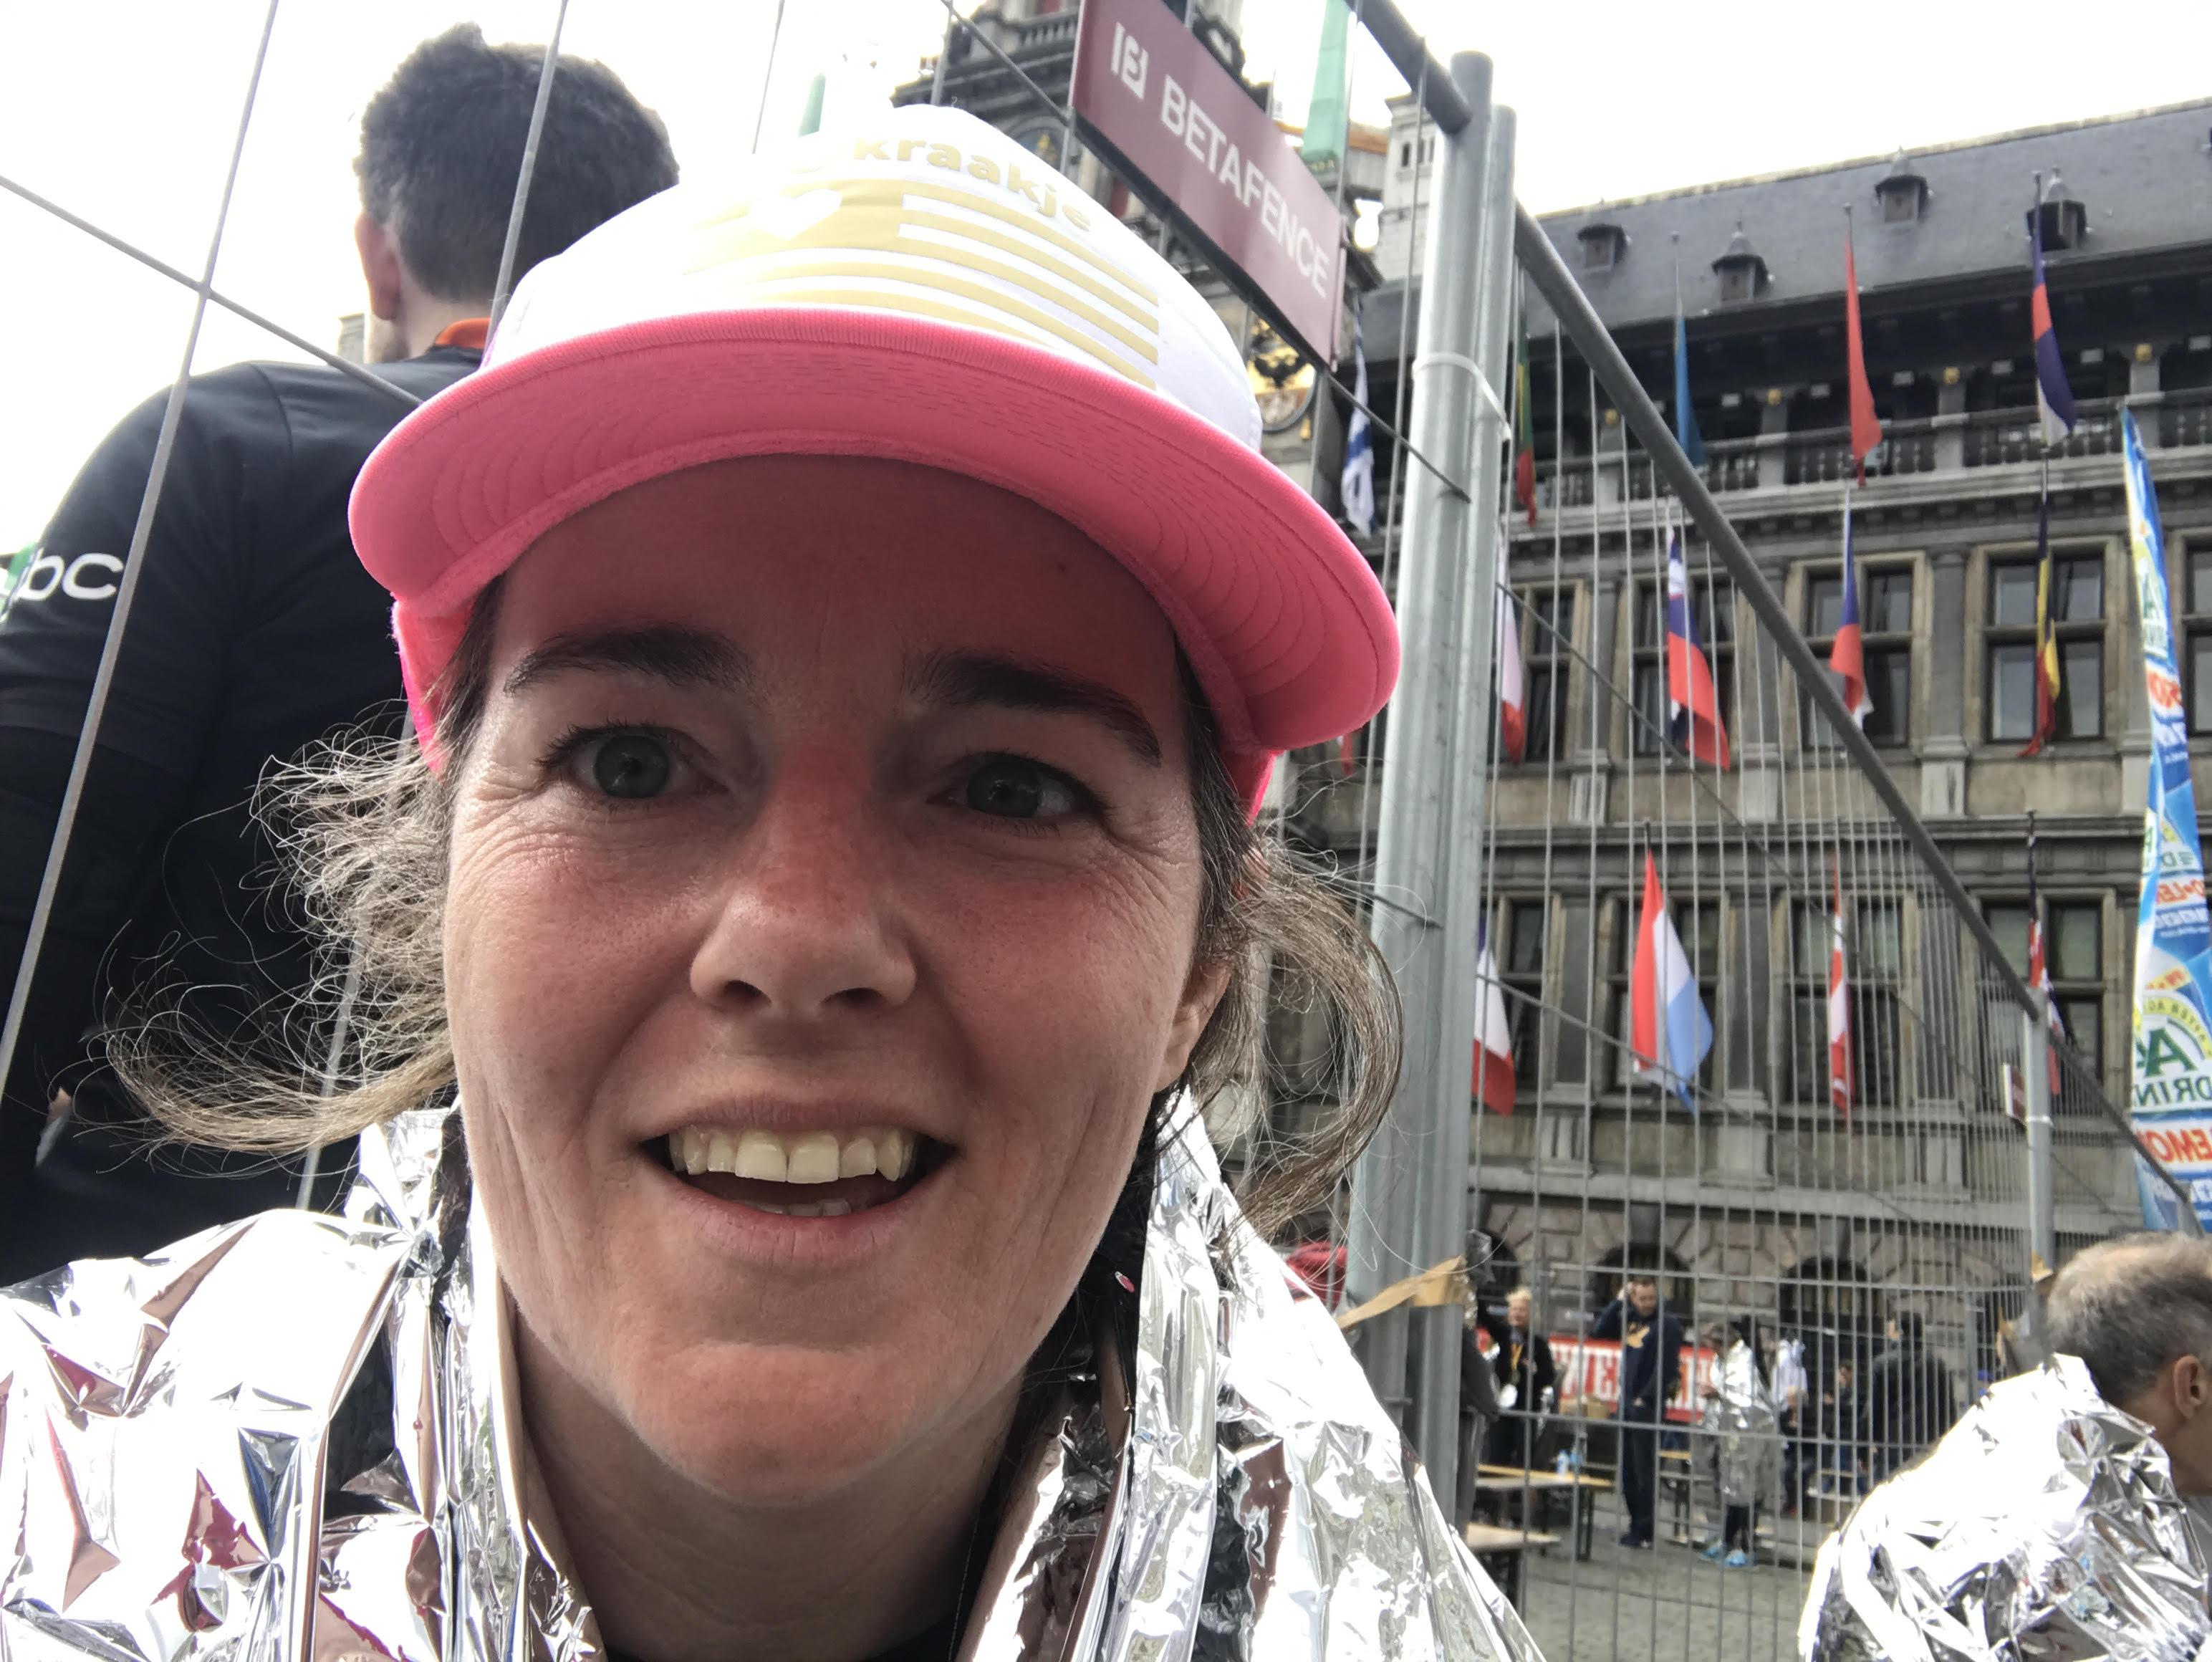 EDC Els zelf marathon